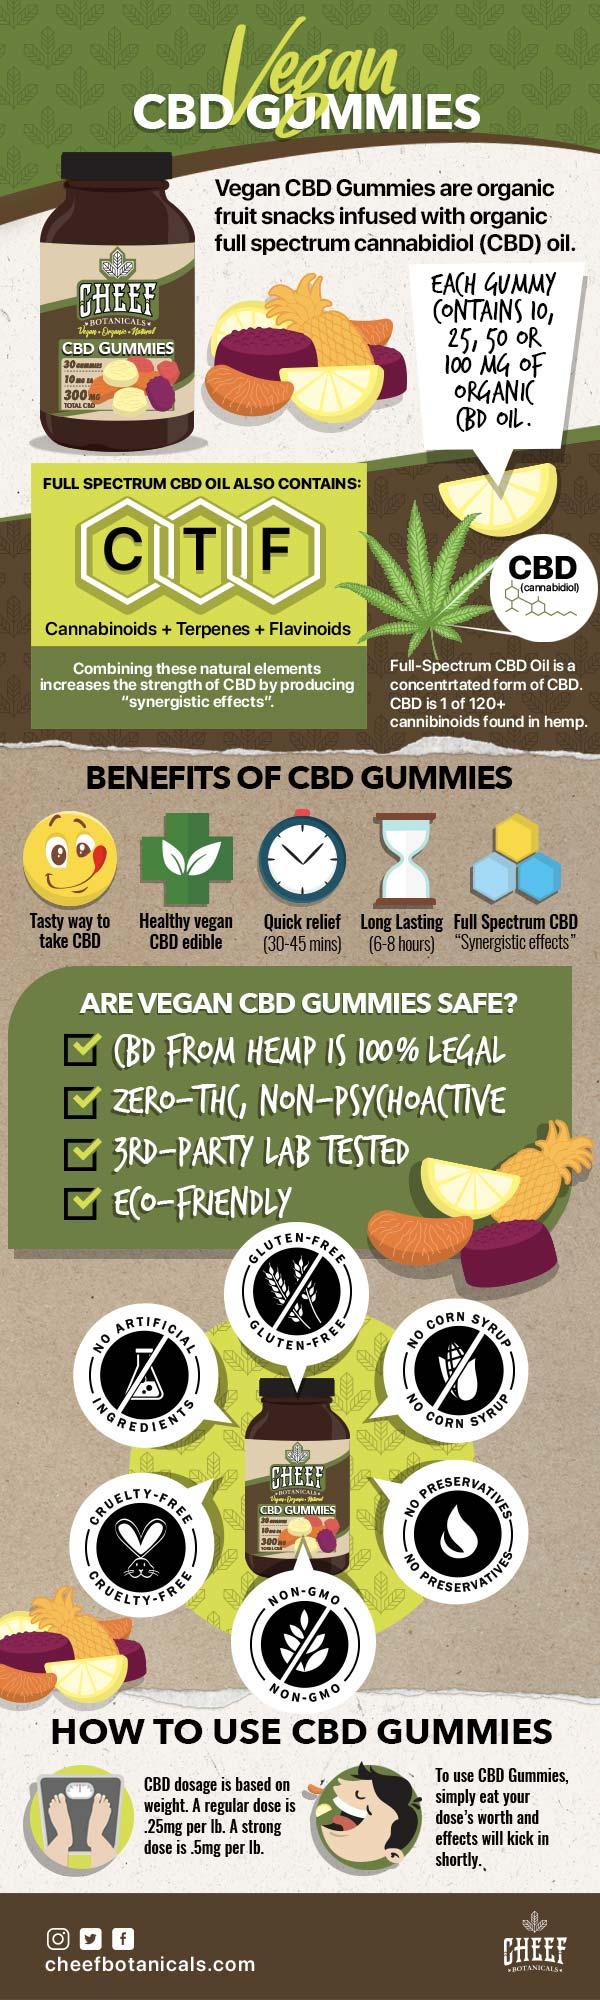 Delicious-Vegan-CBD-Gummies-infographic-plaza